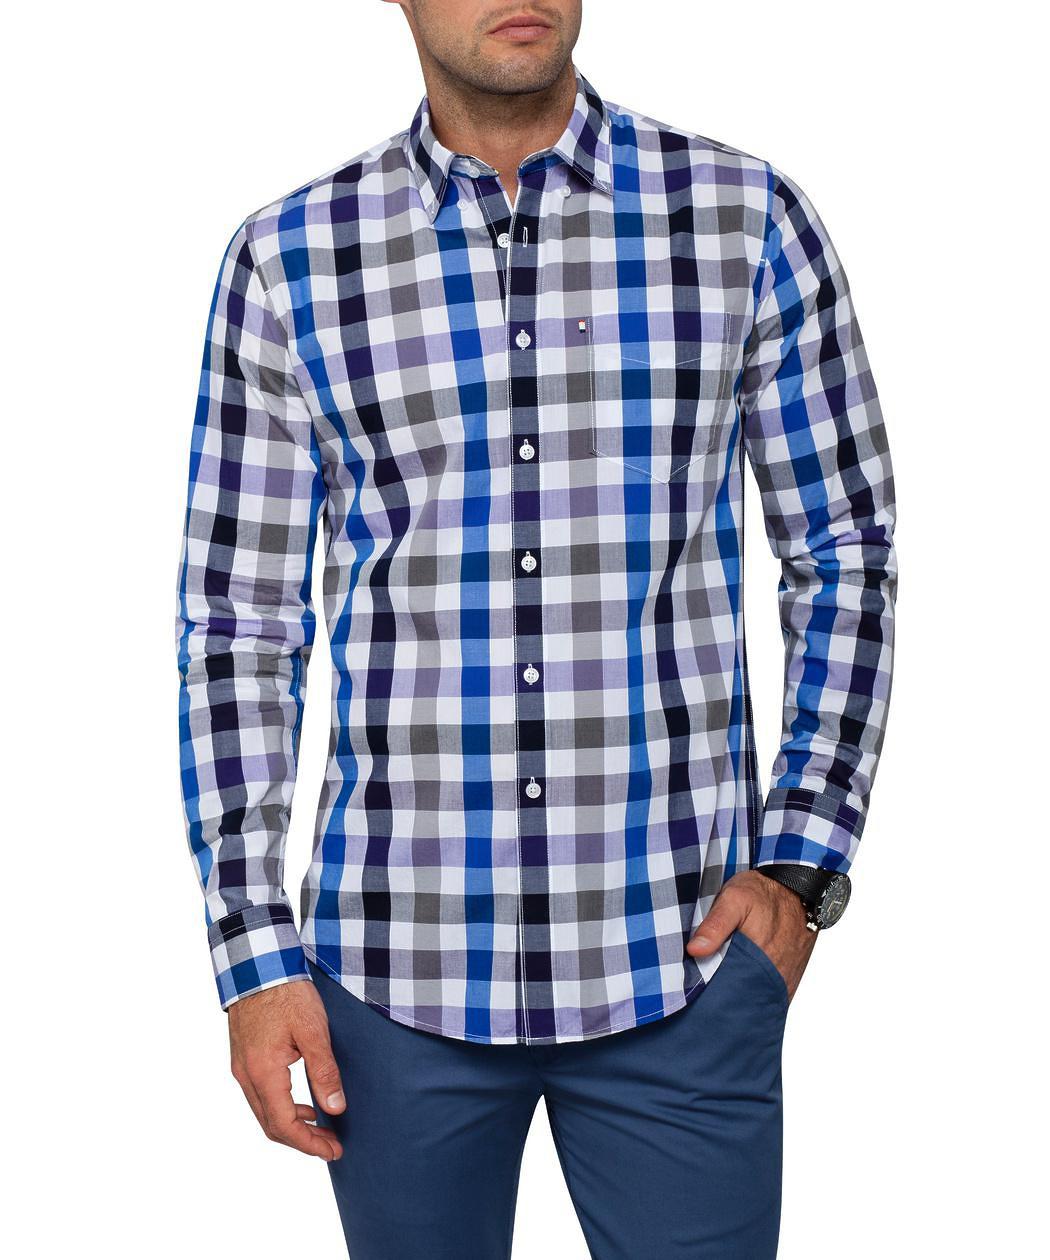 Van heusen casual white blue black check shirt mens for Black and white check mens shirt